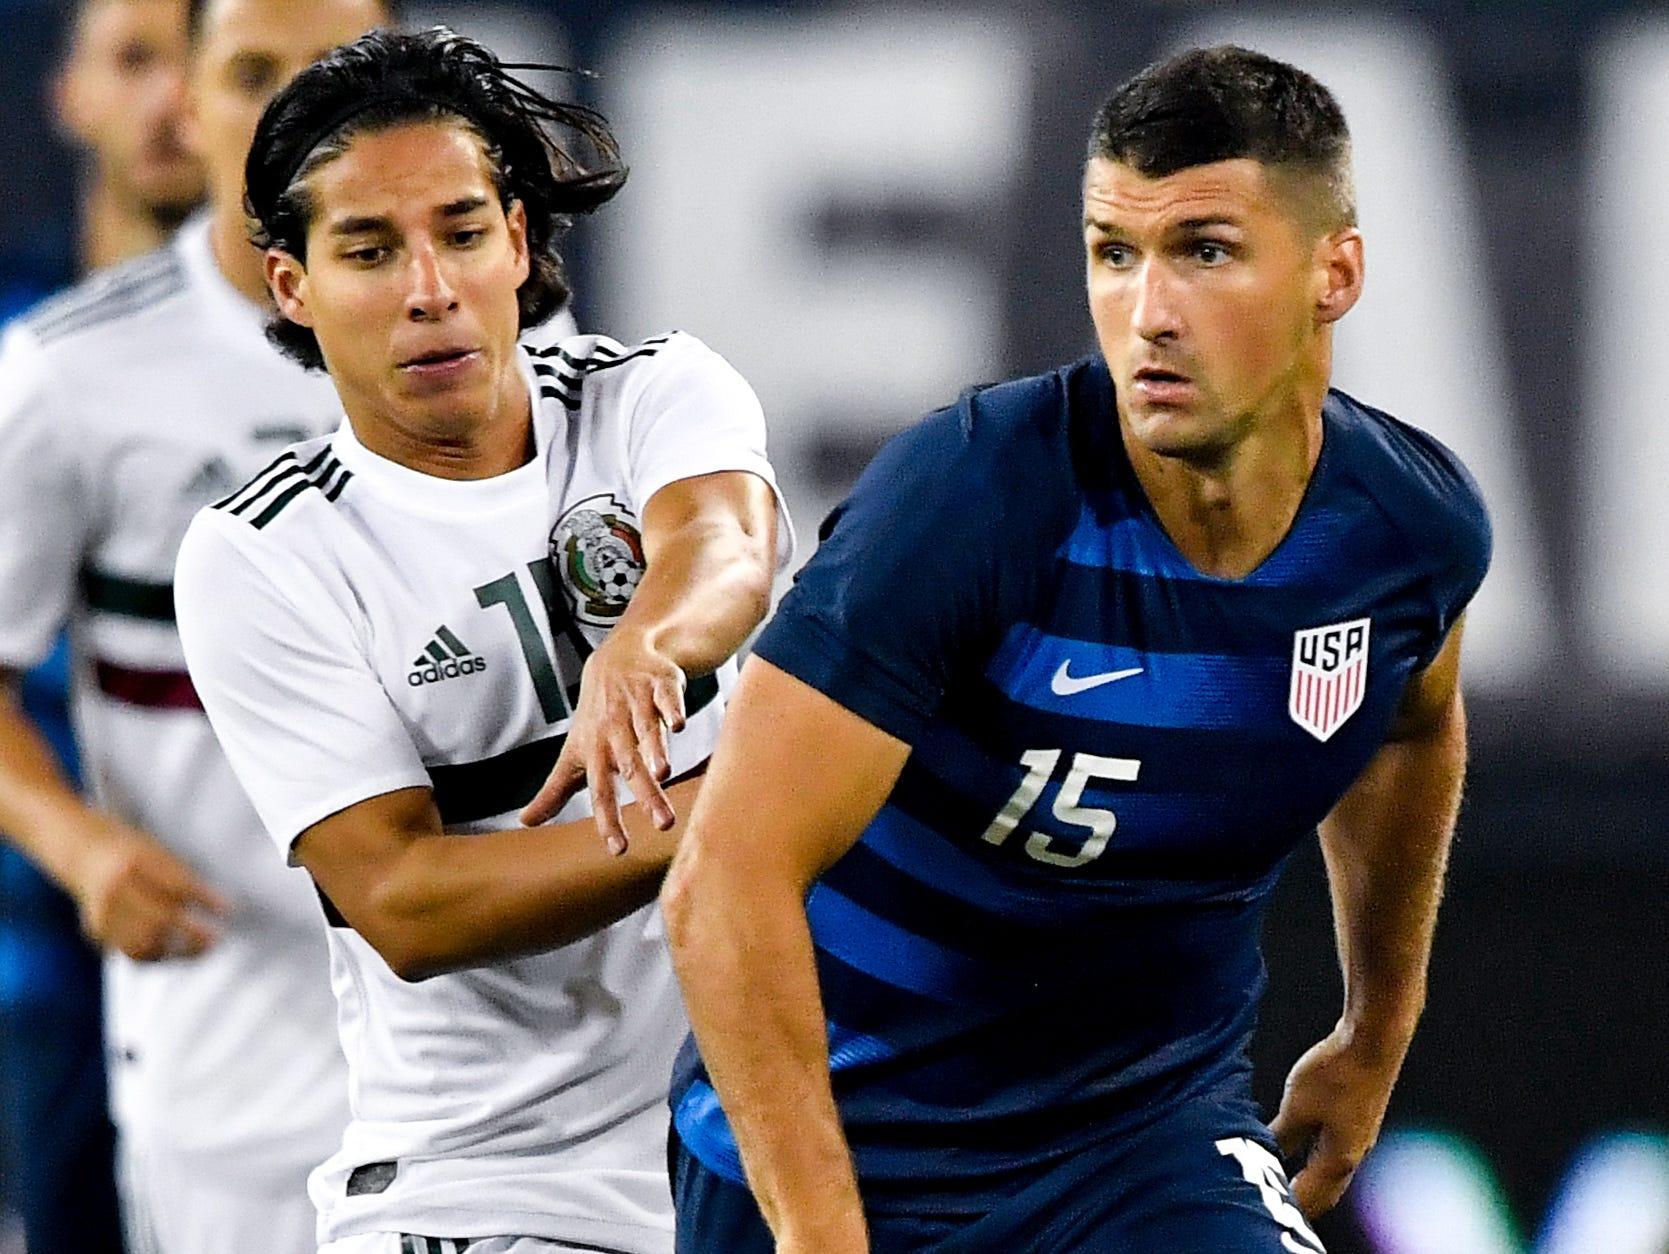 USA defender Eric Lichaj (15) advances past Mexico midfielder Diego Lainez (18) during the first half at Nissan Stadium in Nashville, Tenn., Tuesday, Sept. 11, 2018.